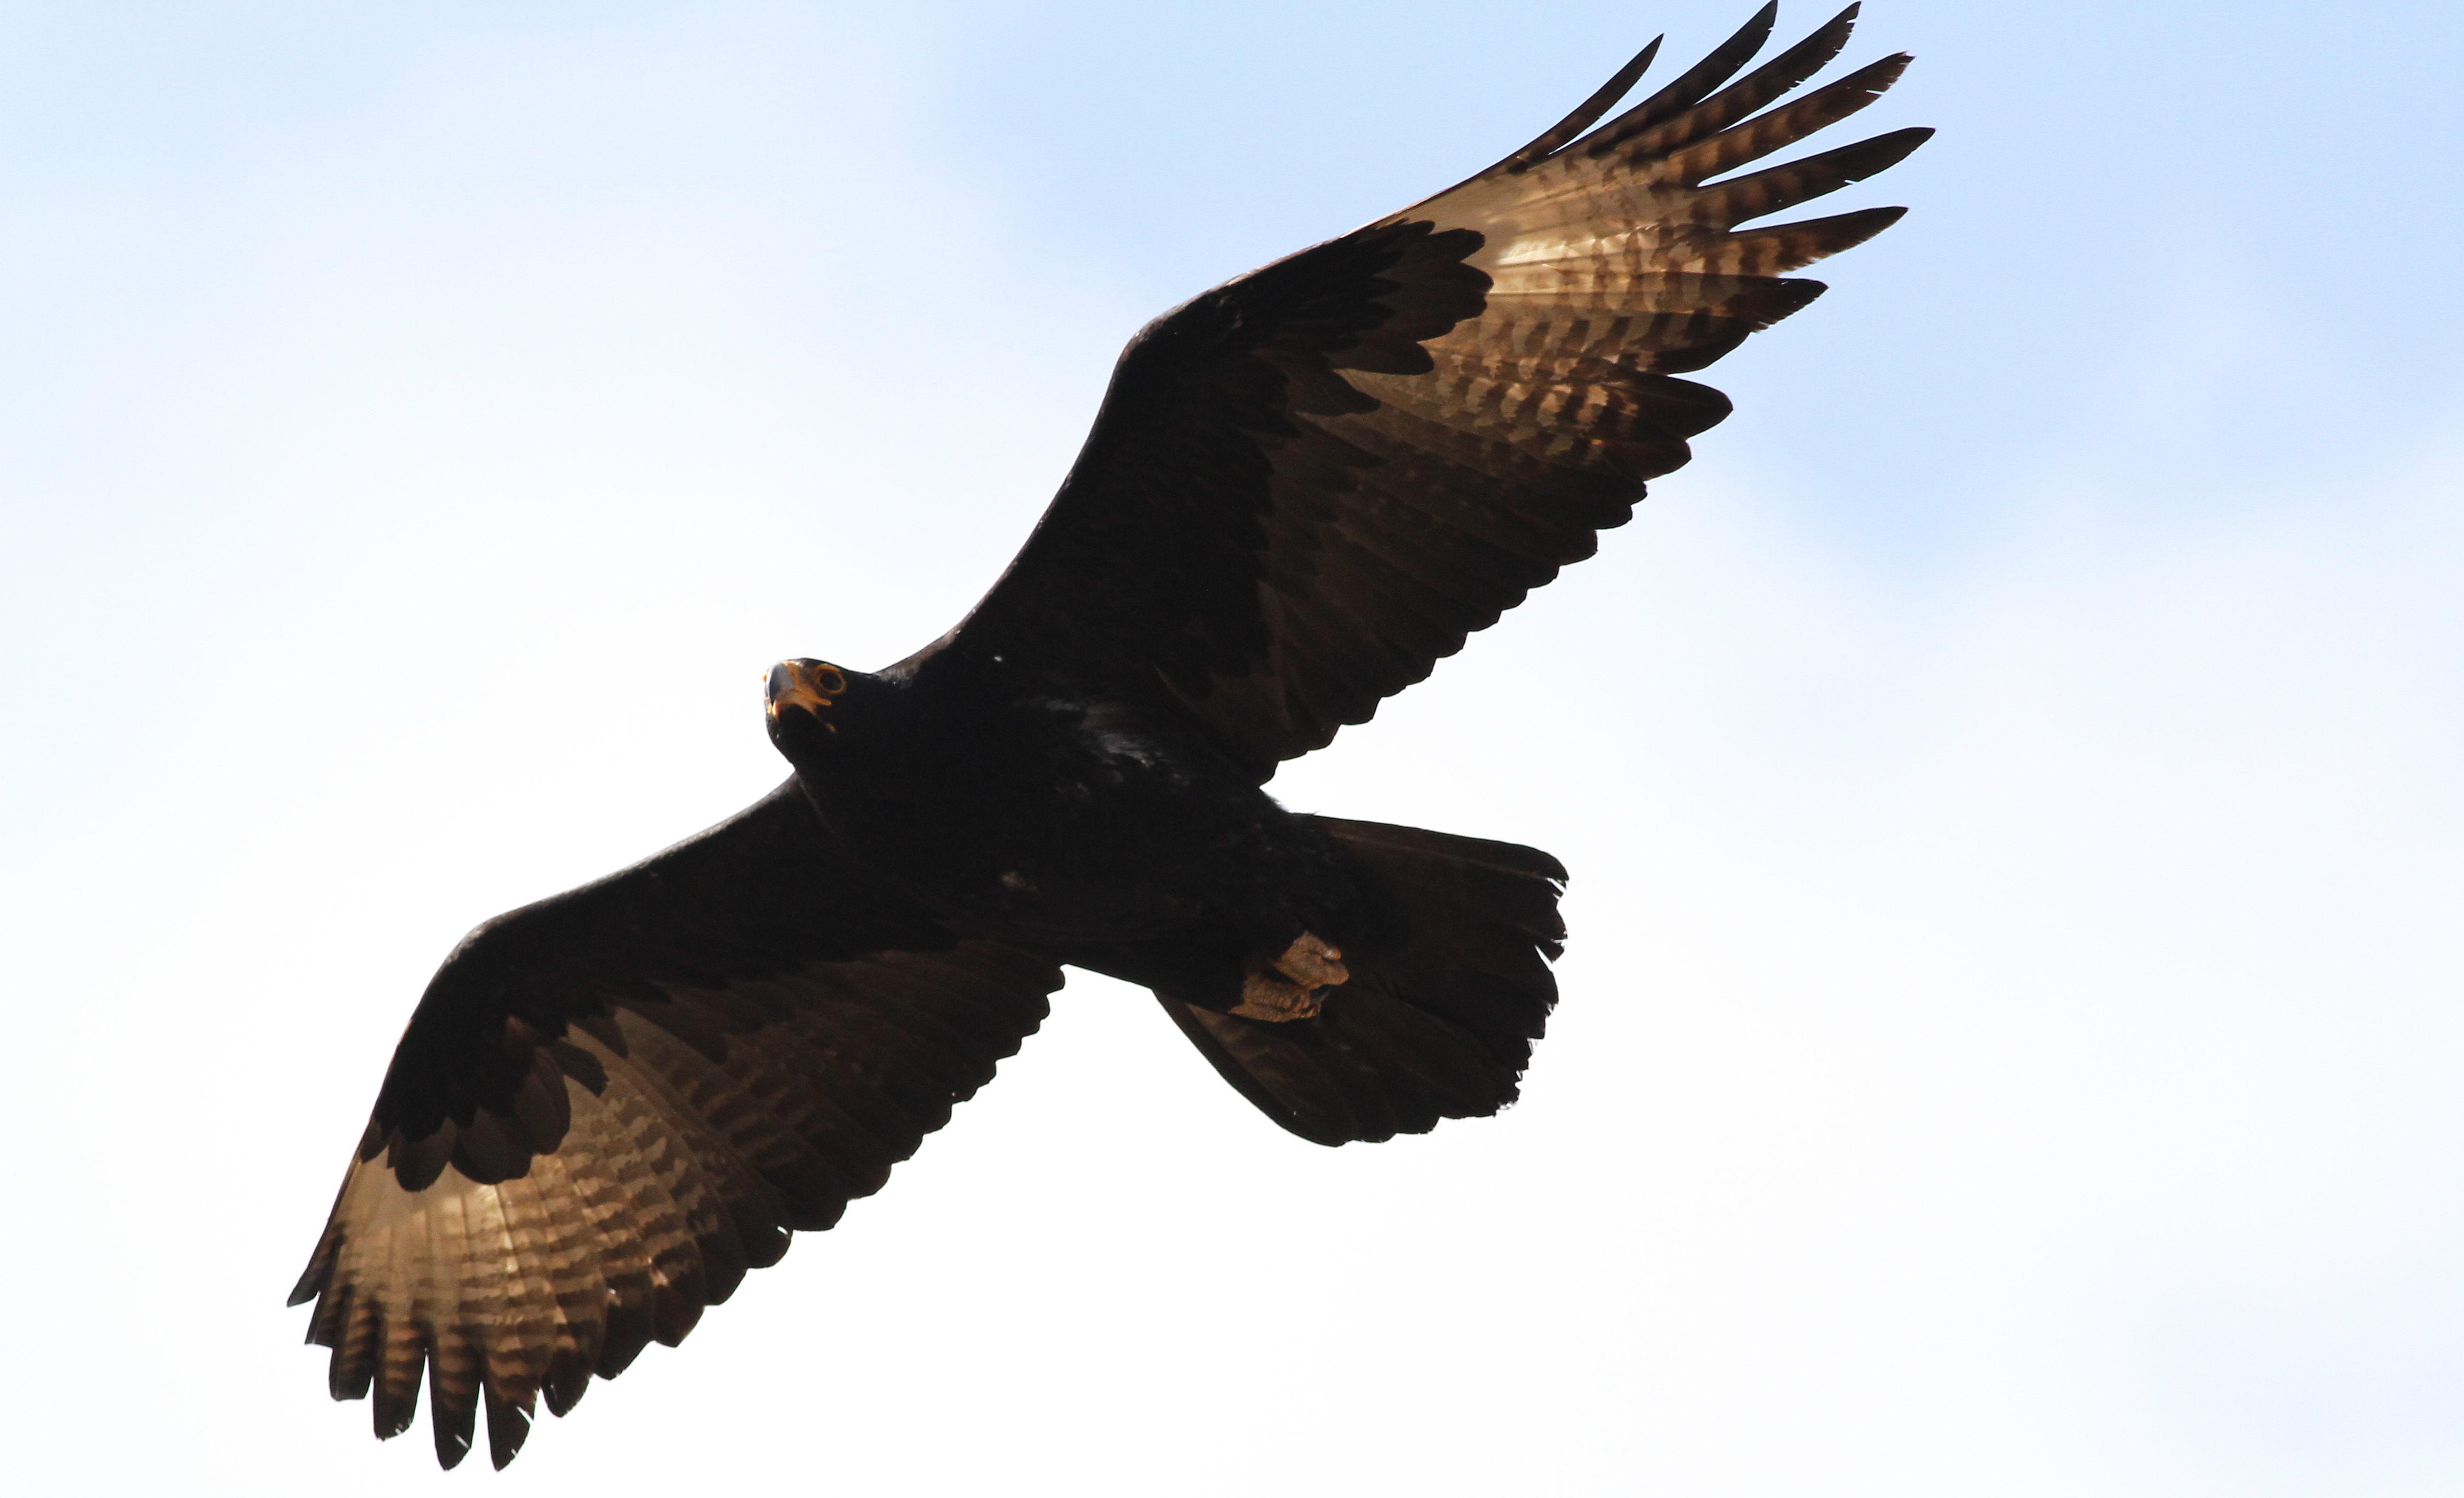 File:Verreaux\'s Eagle. Black Eagle, Aquila verreauxii, at Walter ...